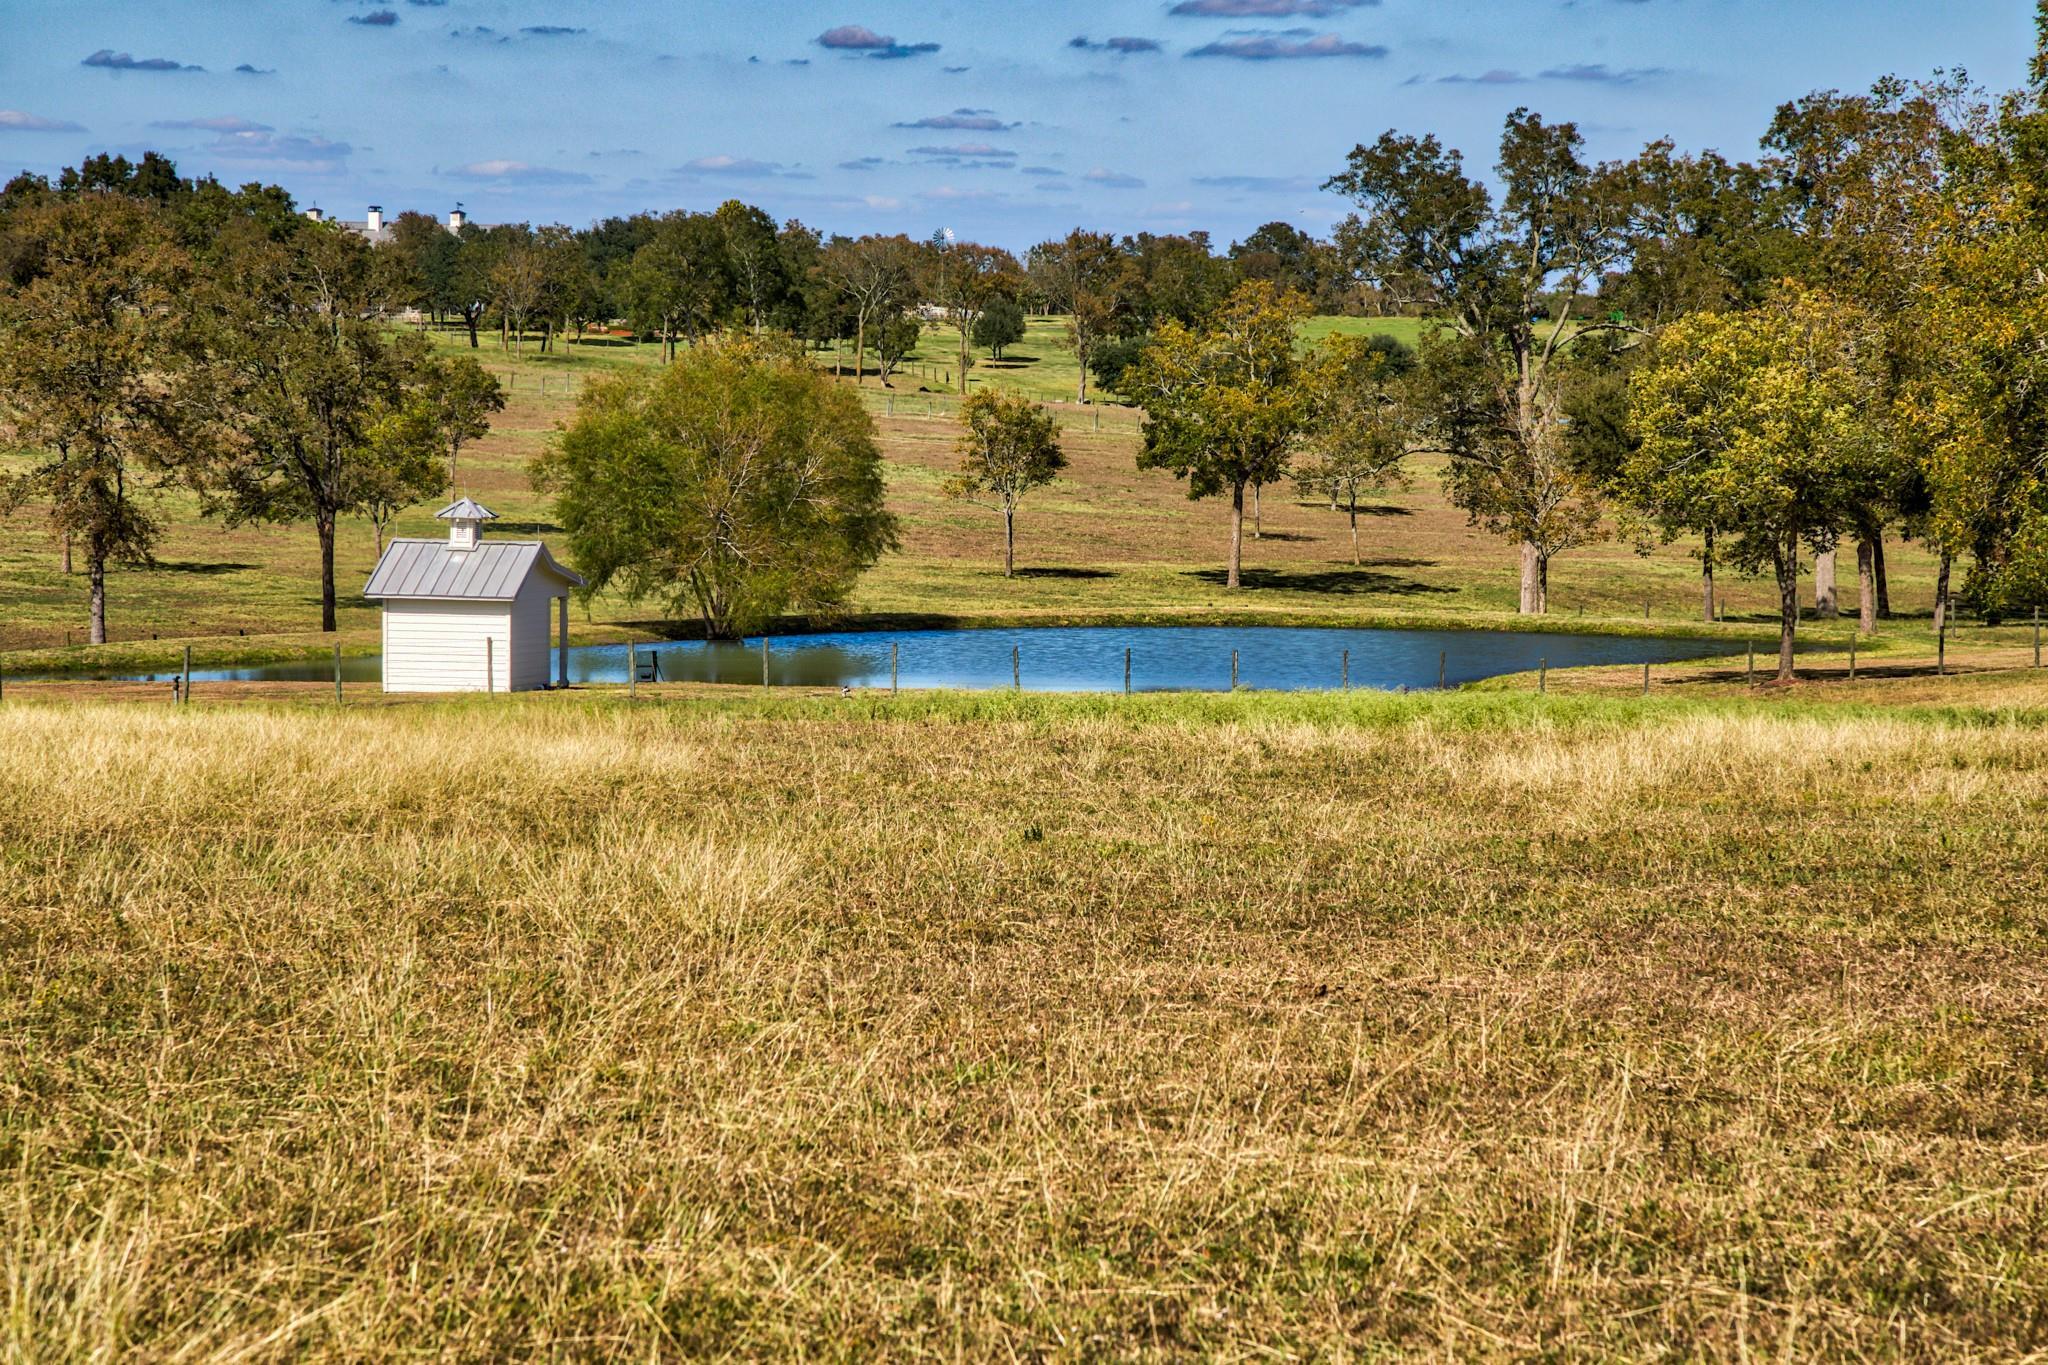 00 Tract B Farm To Market 2447 E Property Photo 1